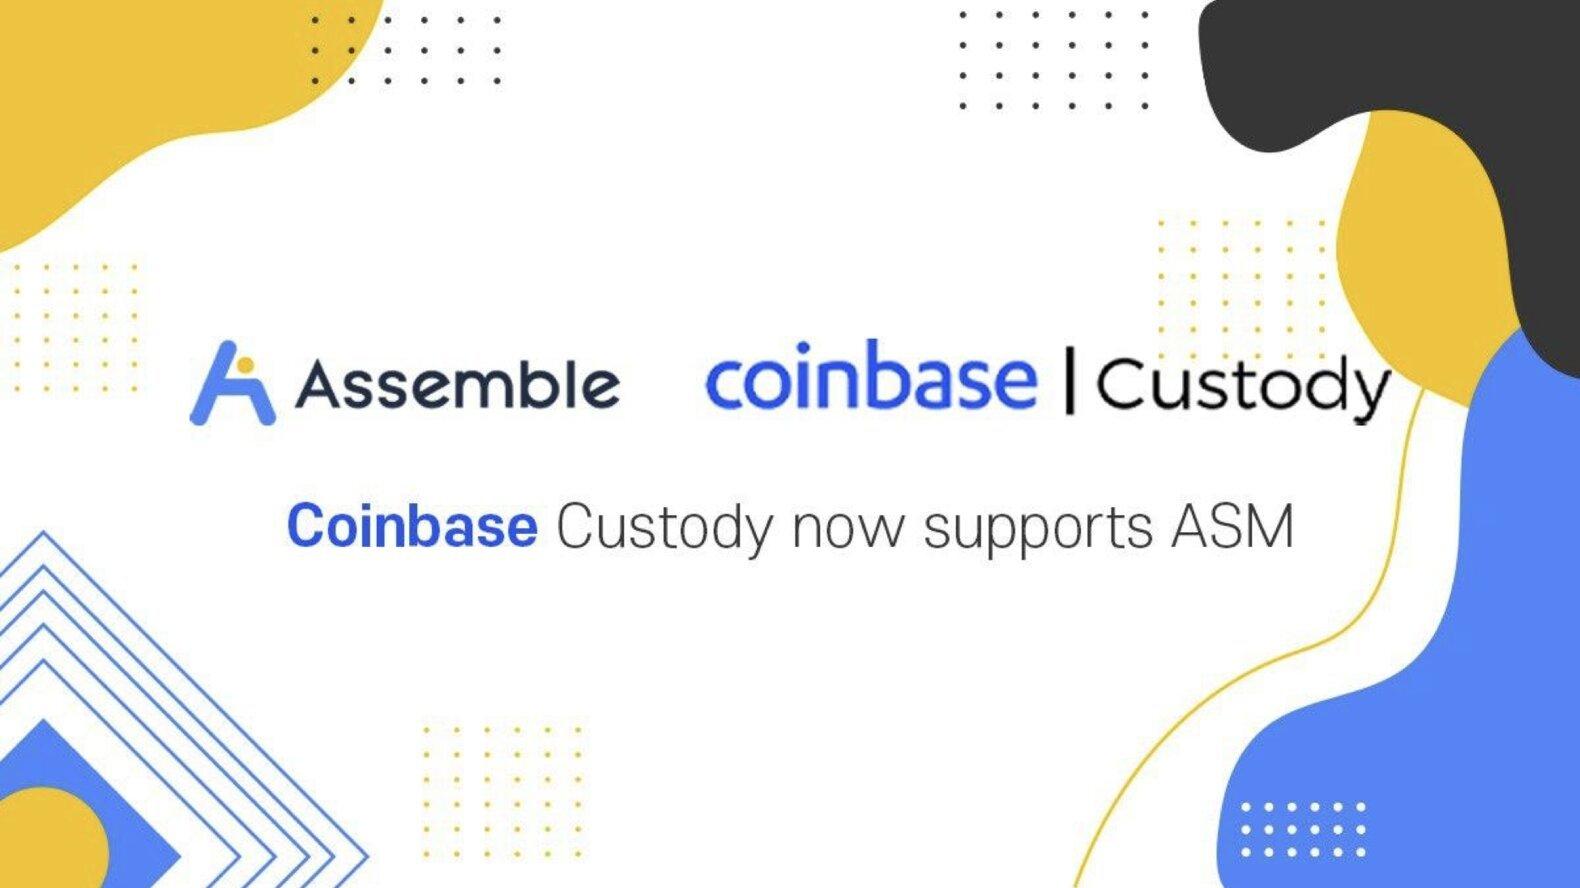 Coinbase托管现在支持ASSEMBLE协议(ASM)